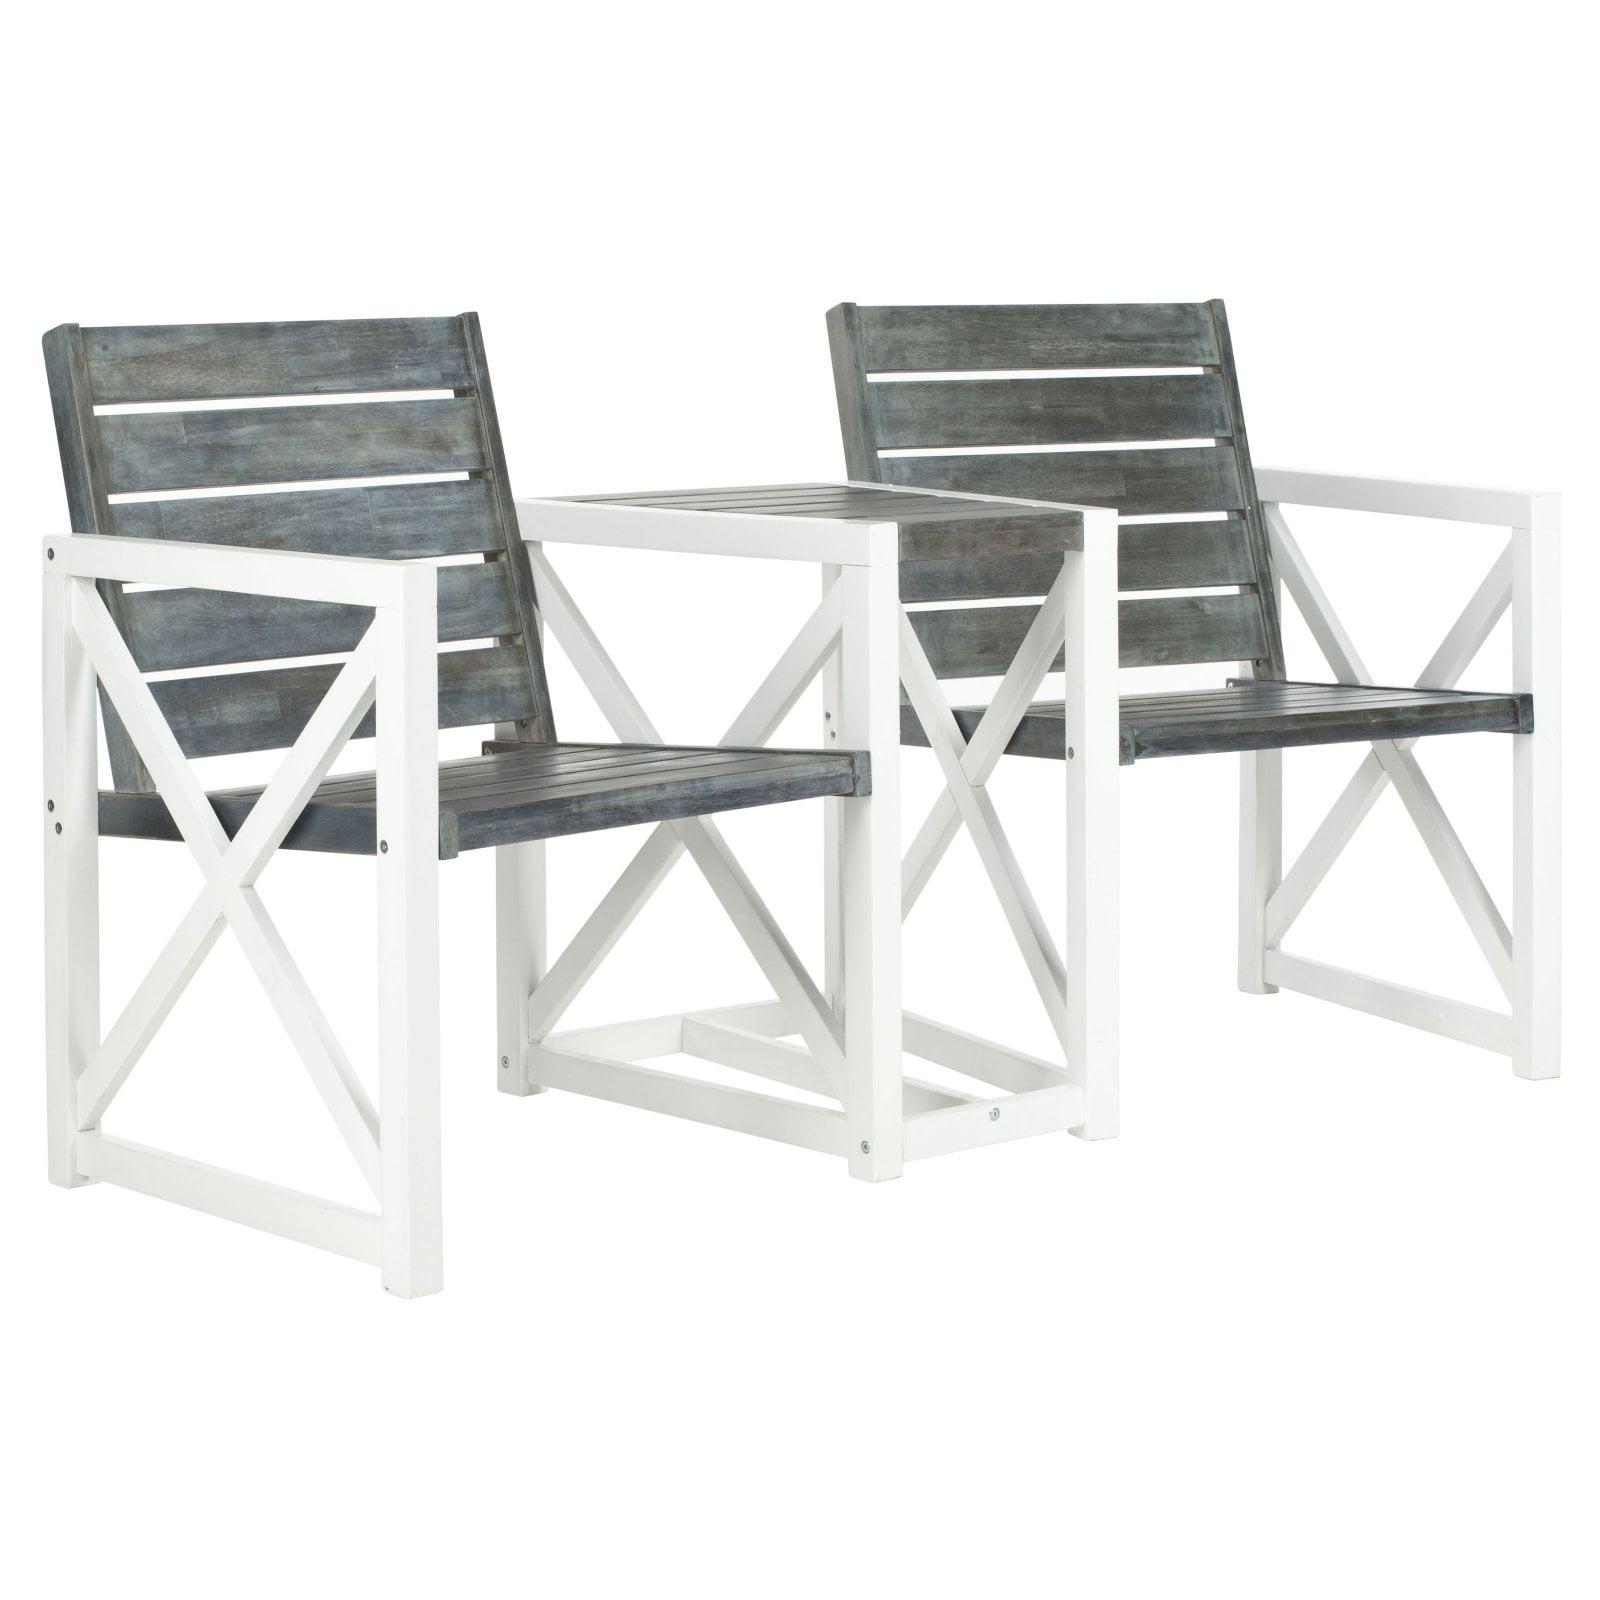 Safavieh Jovanna Indoor/Outdoor Contemporary 2 Seat Bench